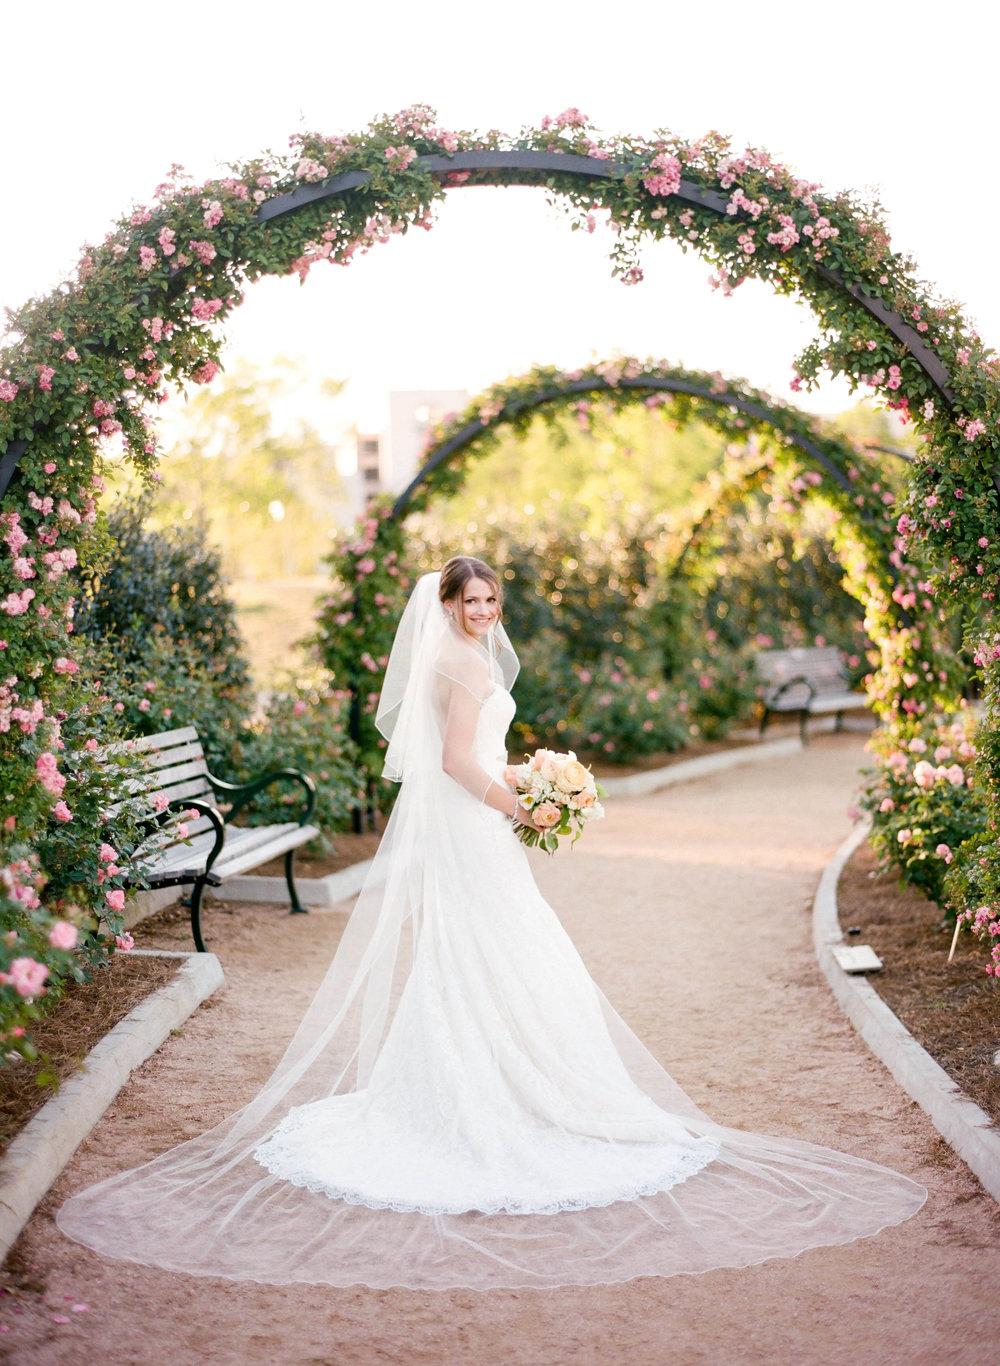 Houston-Wedding-Photographer-Film-Fine-Art-Bridals-Dana+Fernandez-Photography-1.jpg